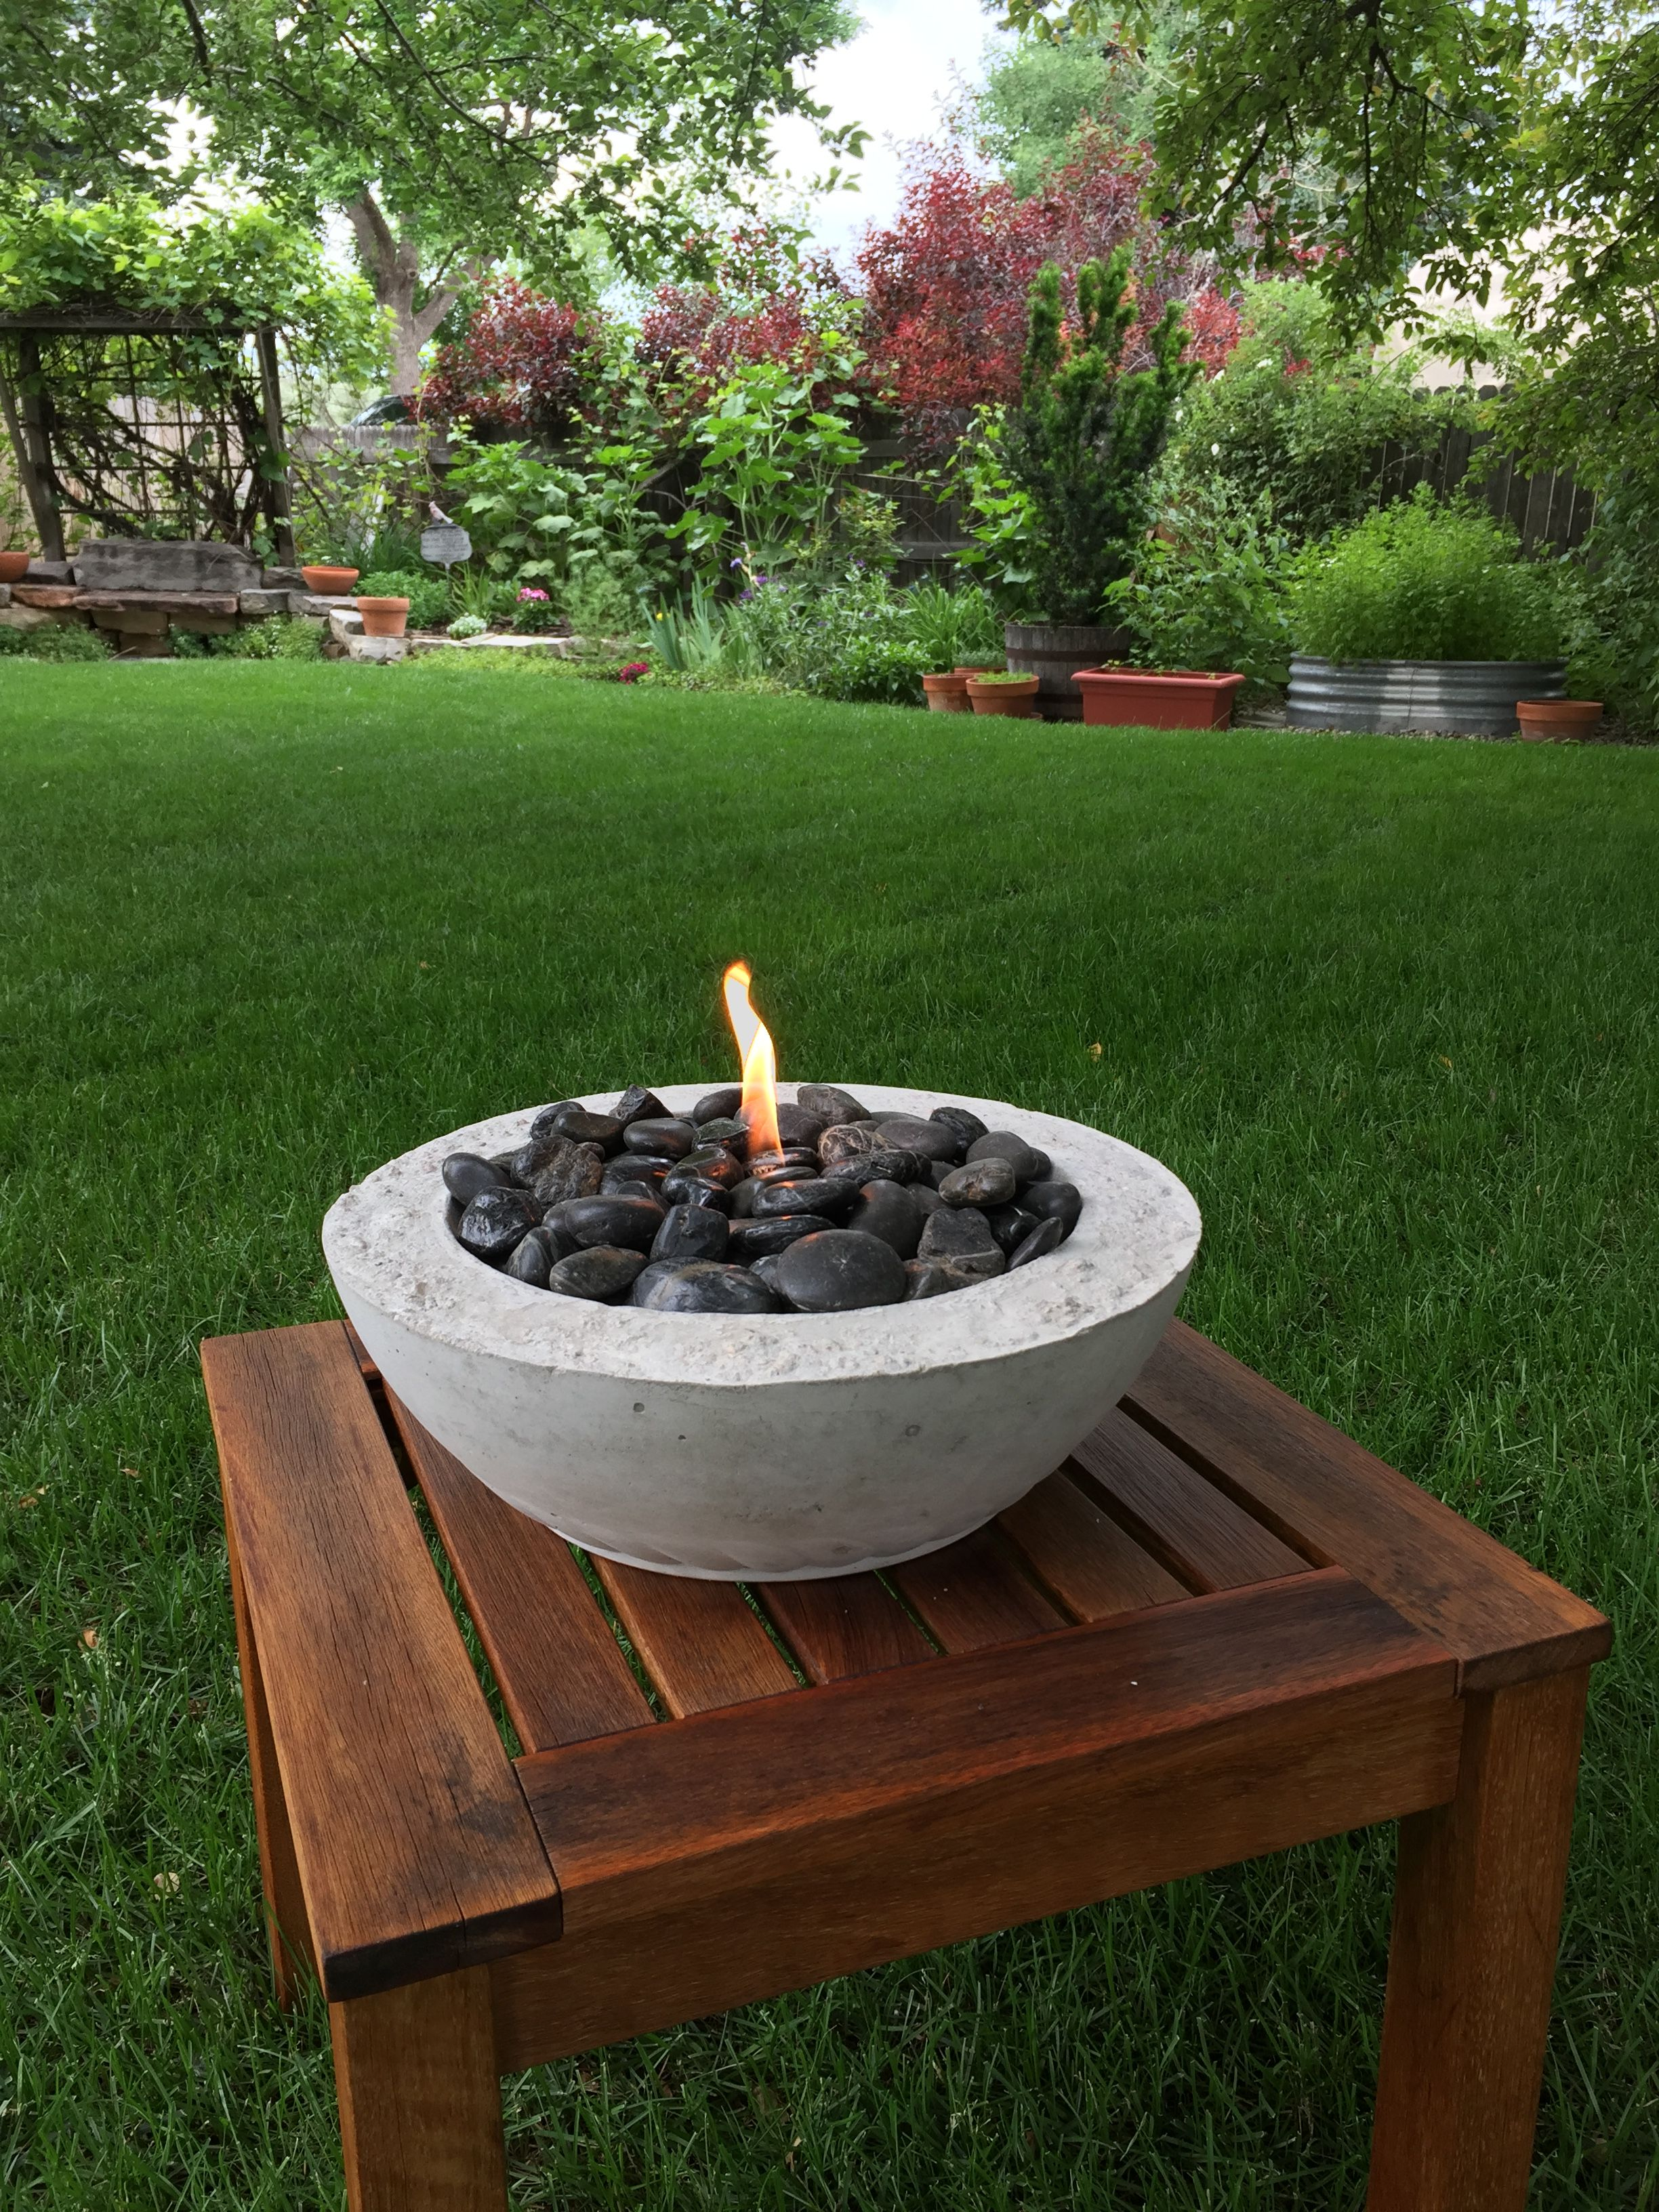 Diy tabletop fire bowl tabletop fire bowl fire bowls